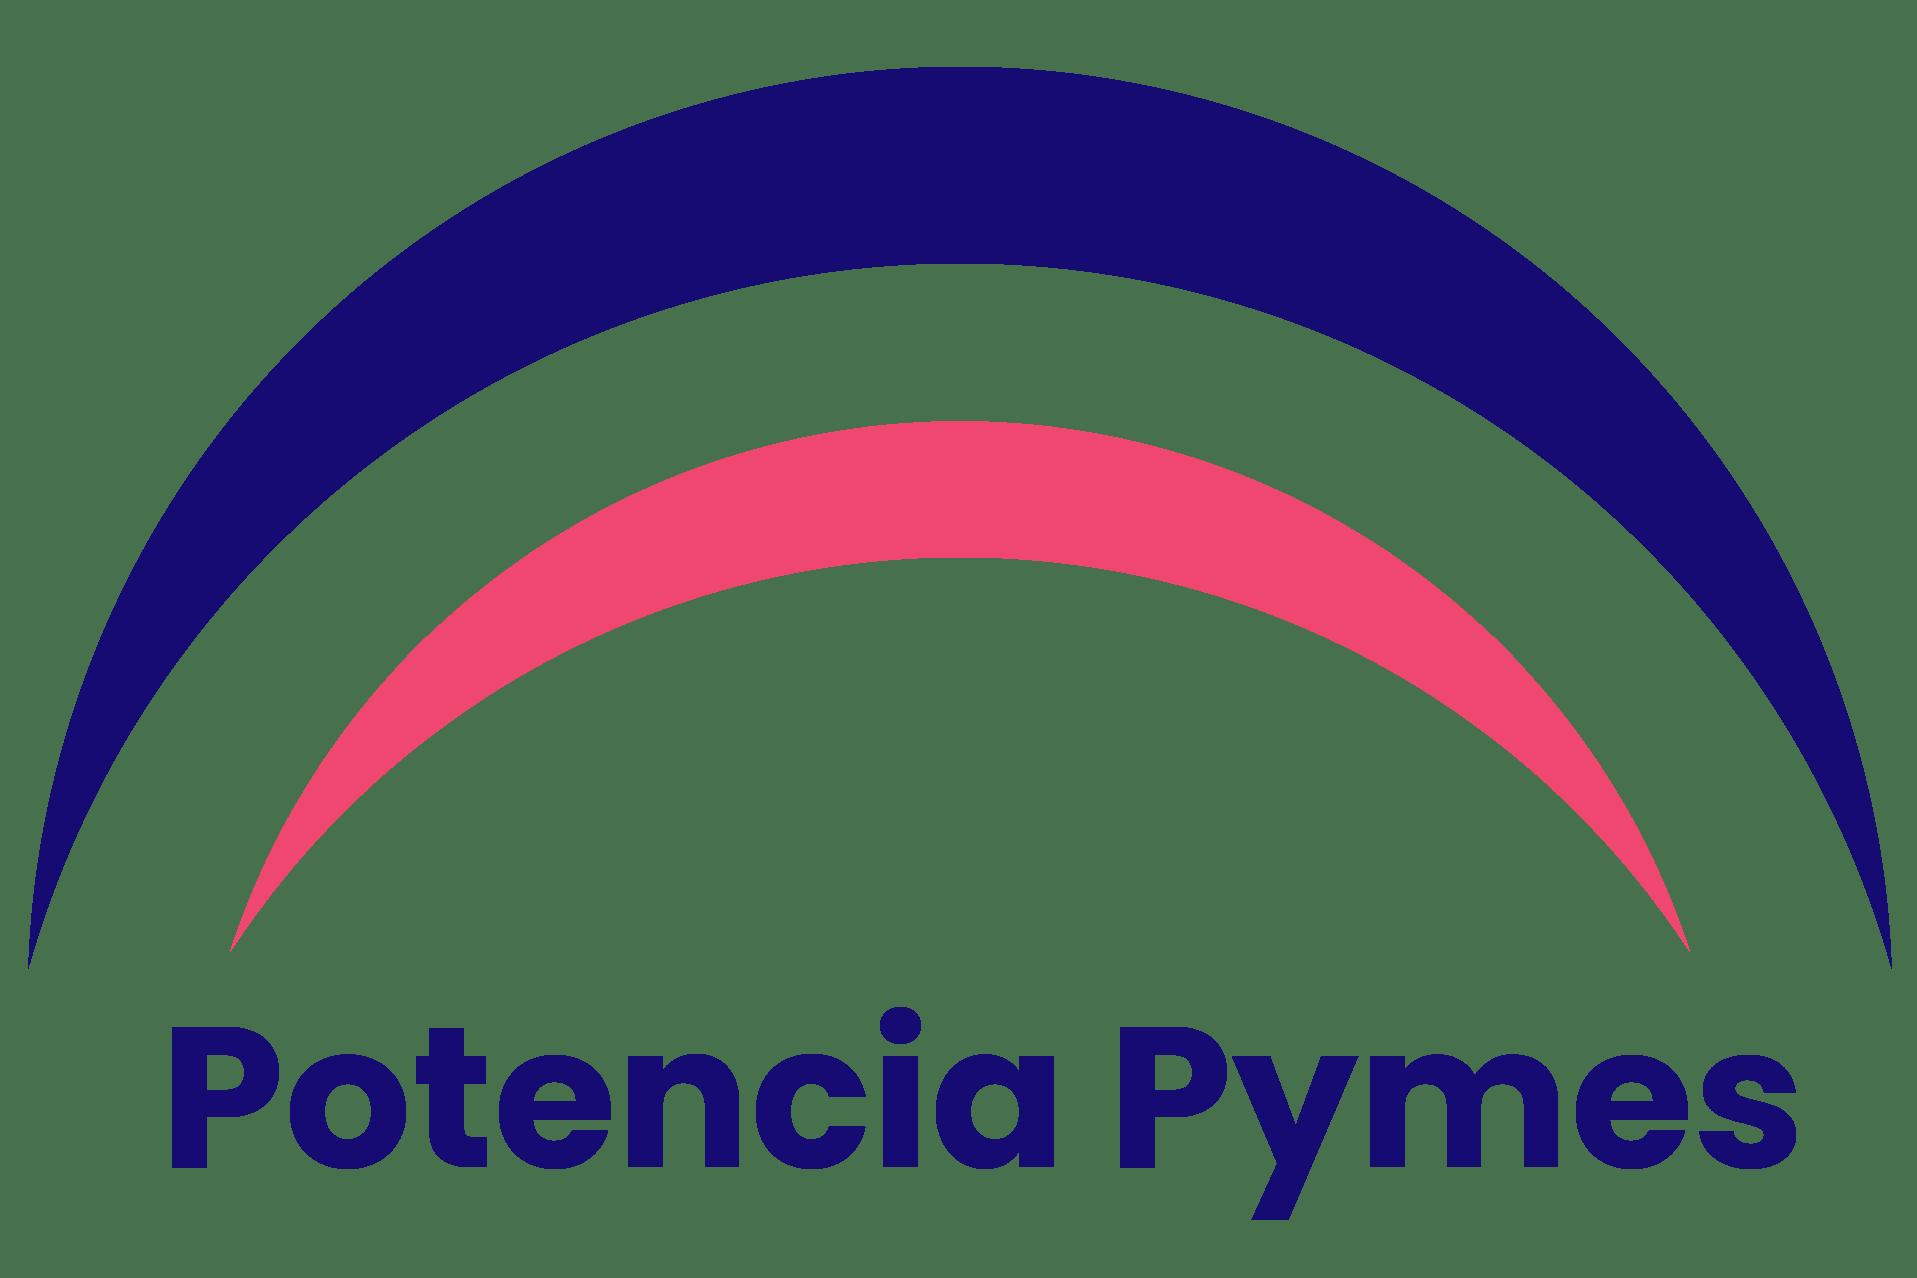 Potencia Pymes